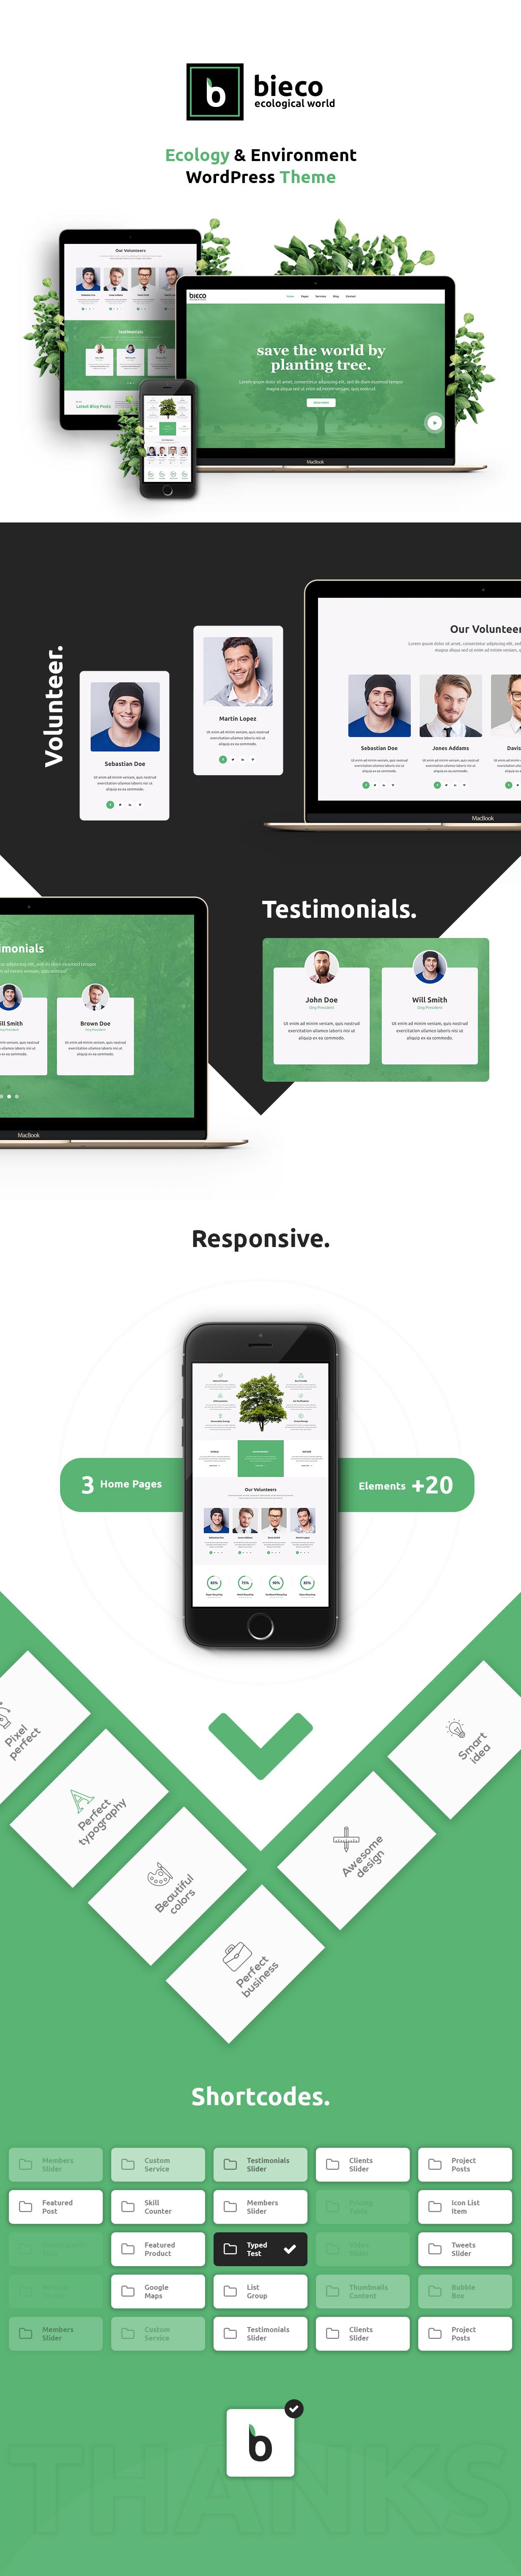 Bieco - Environment & Ecology WordPress Theme - 2